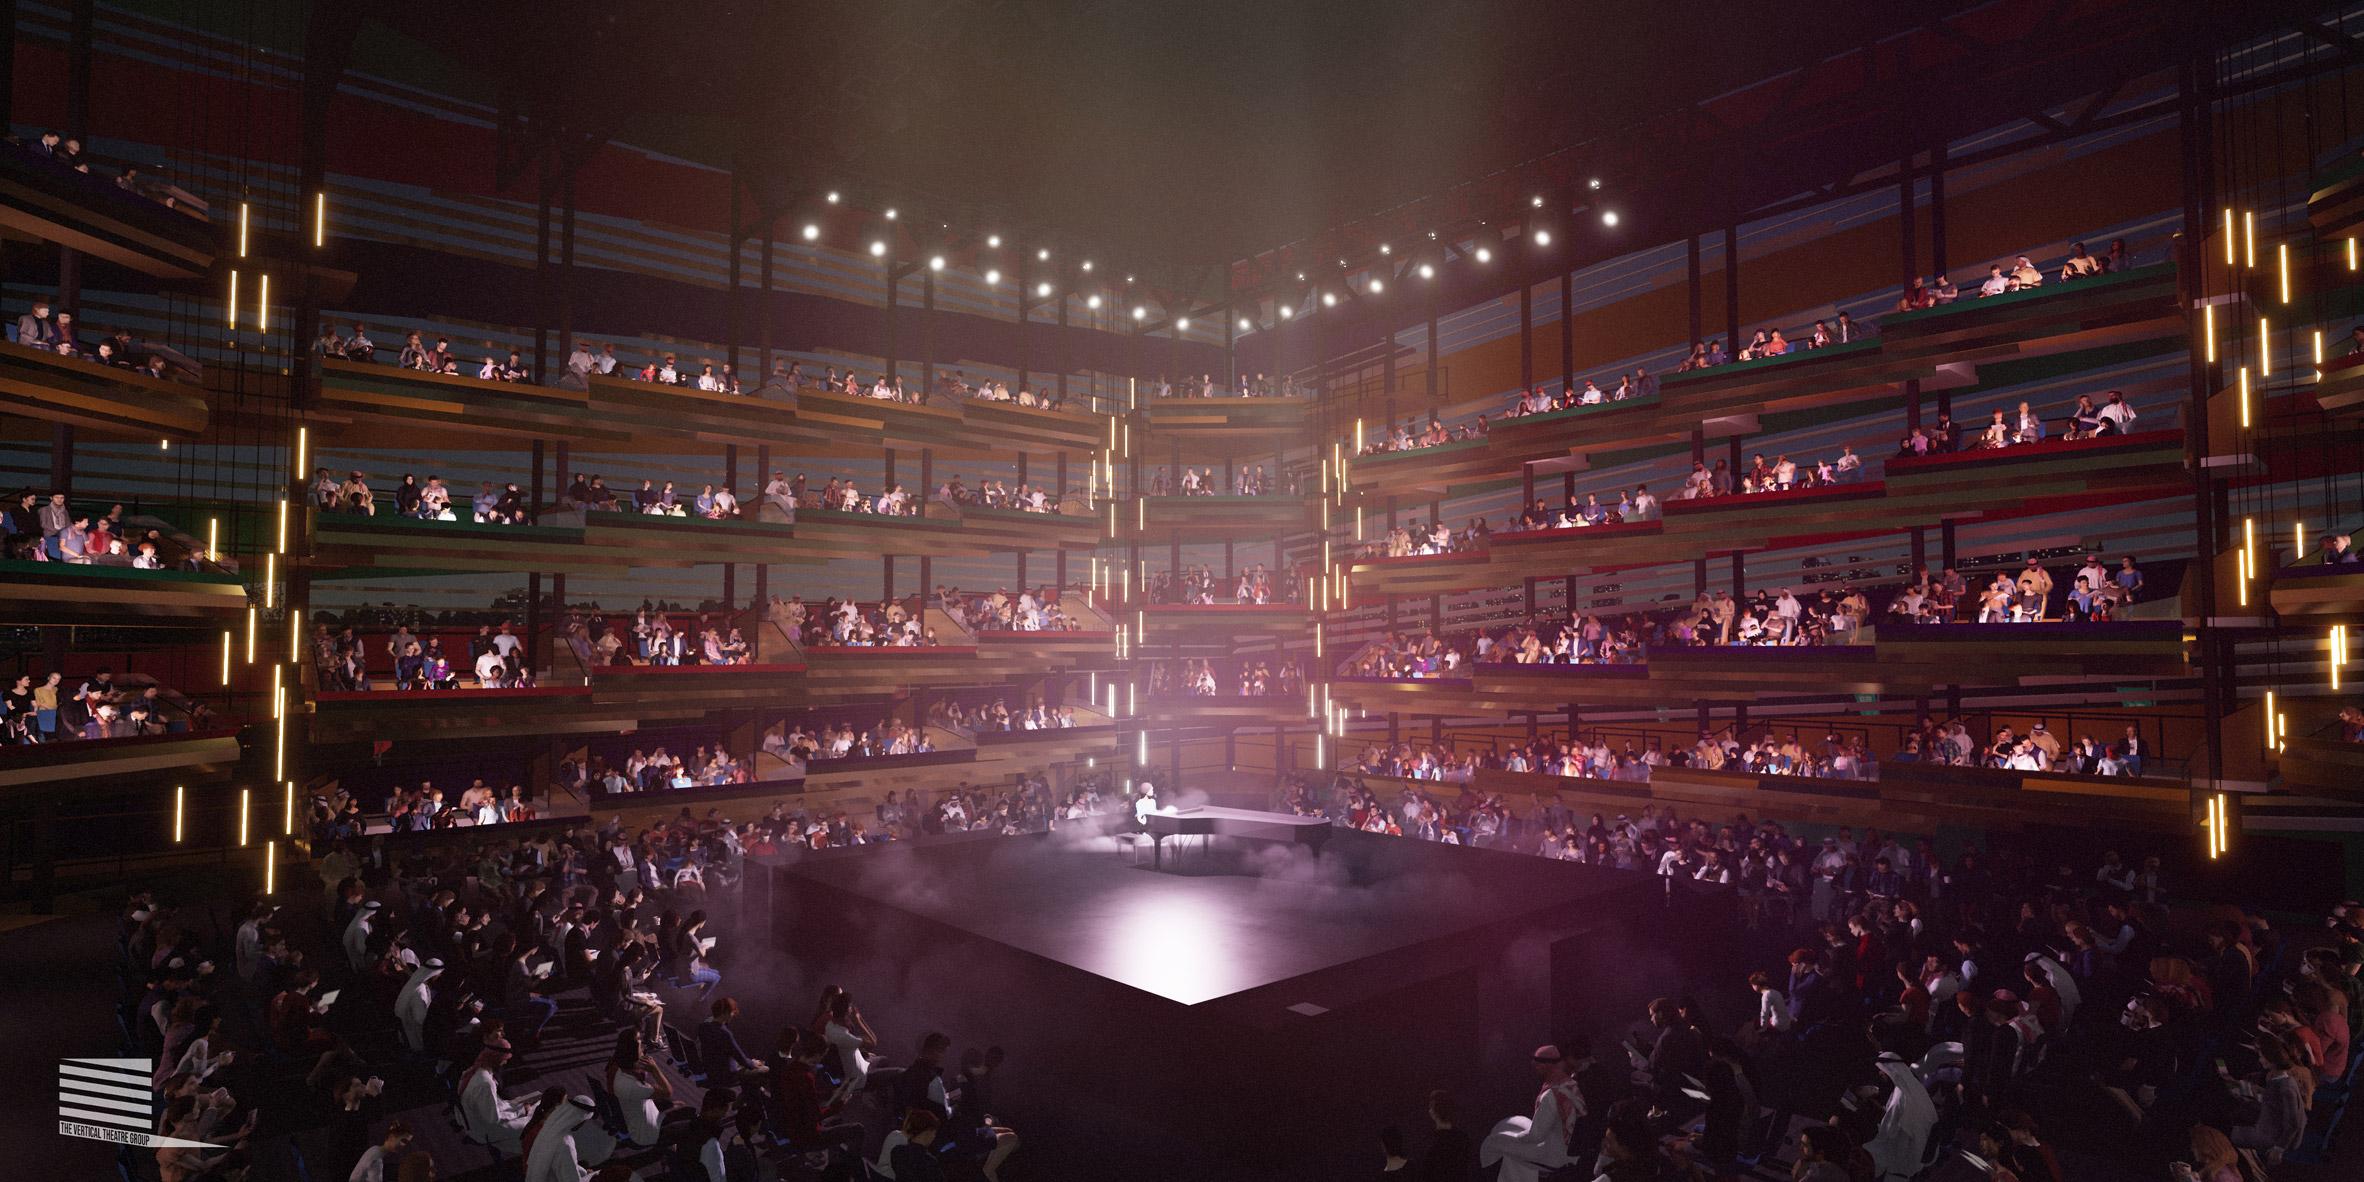 Socially distanced Vertical Theatre